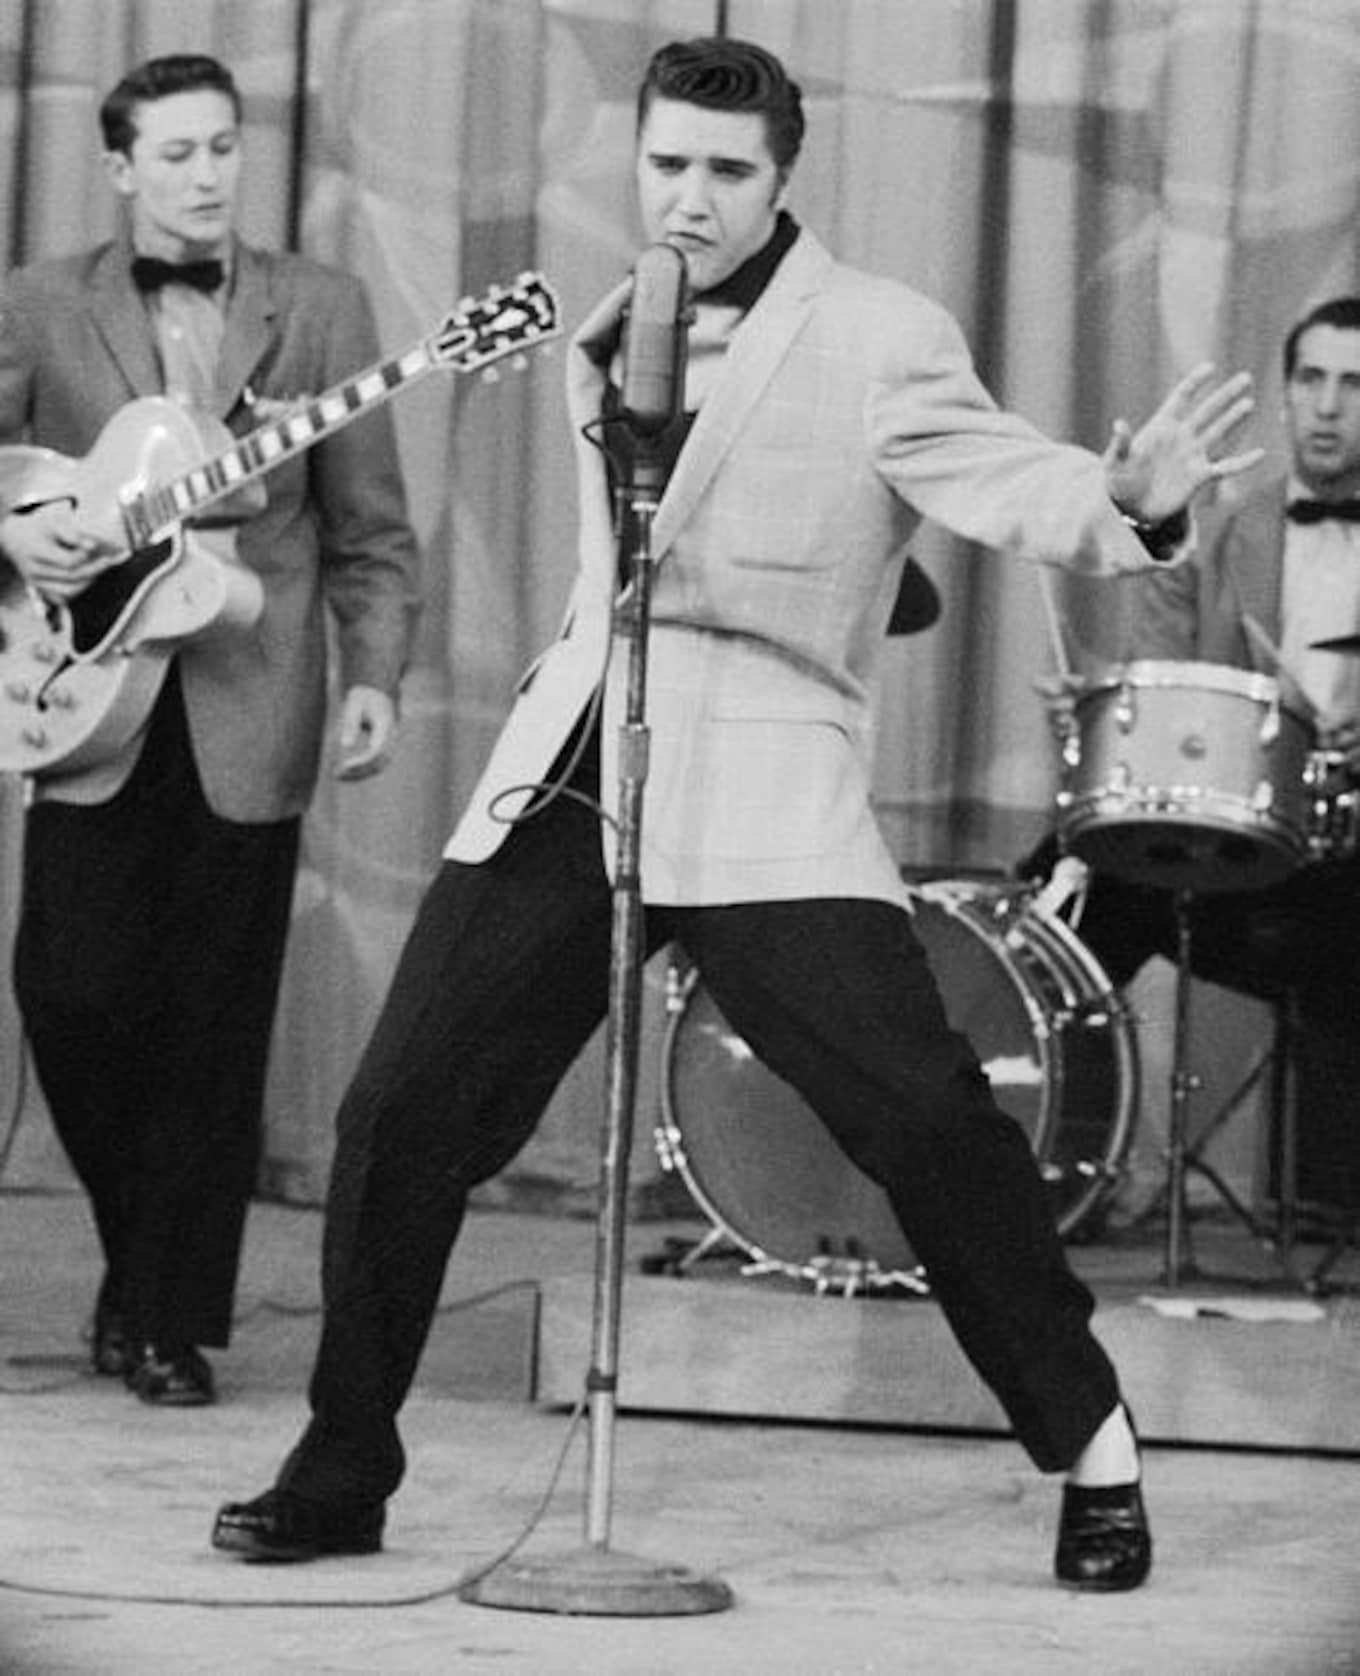 Johnny Rock Dance Shoes